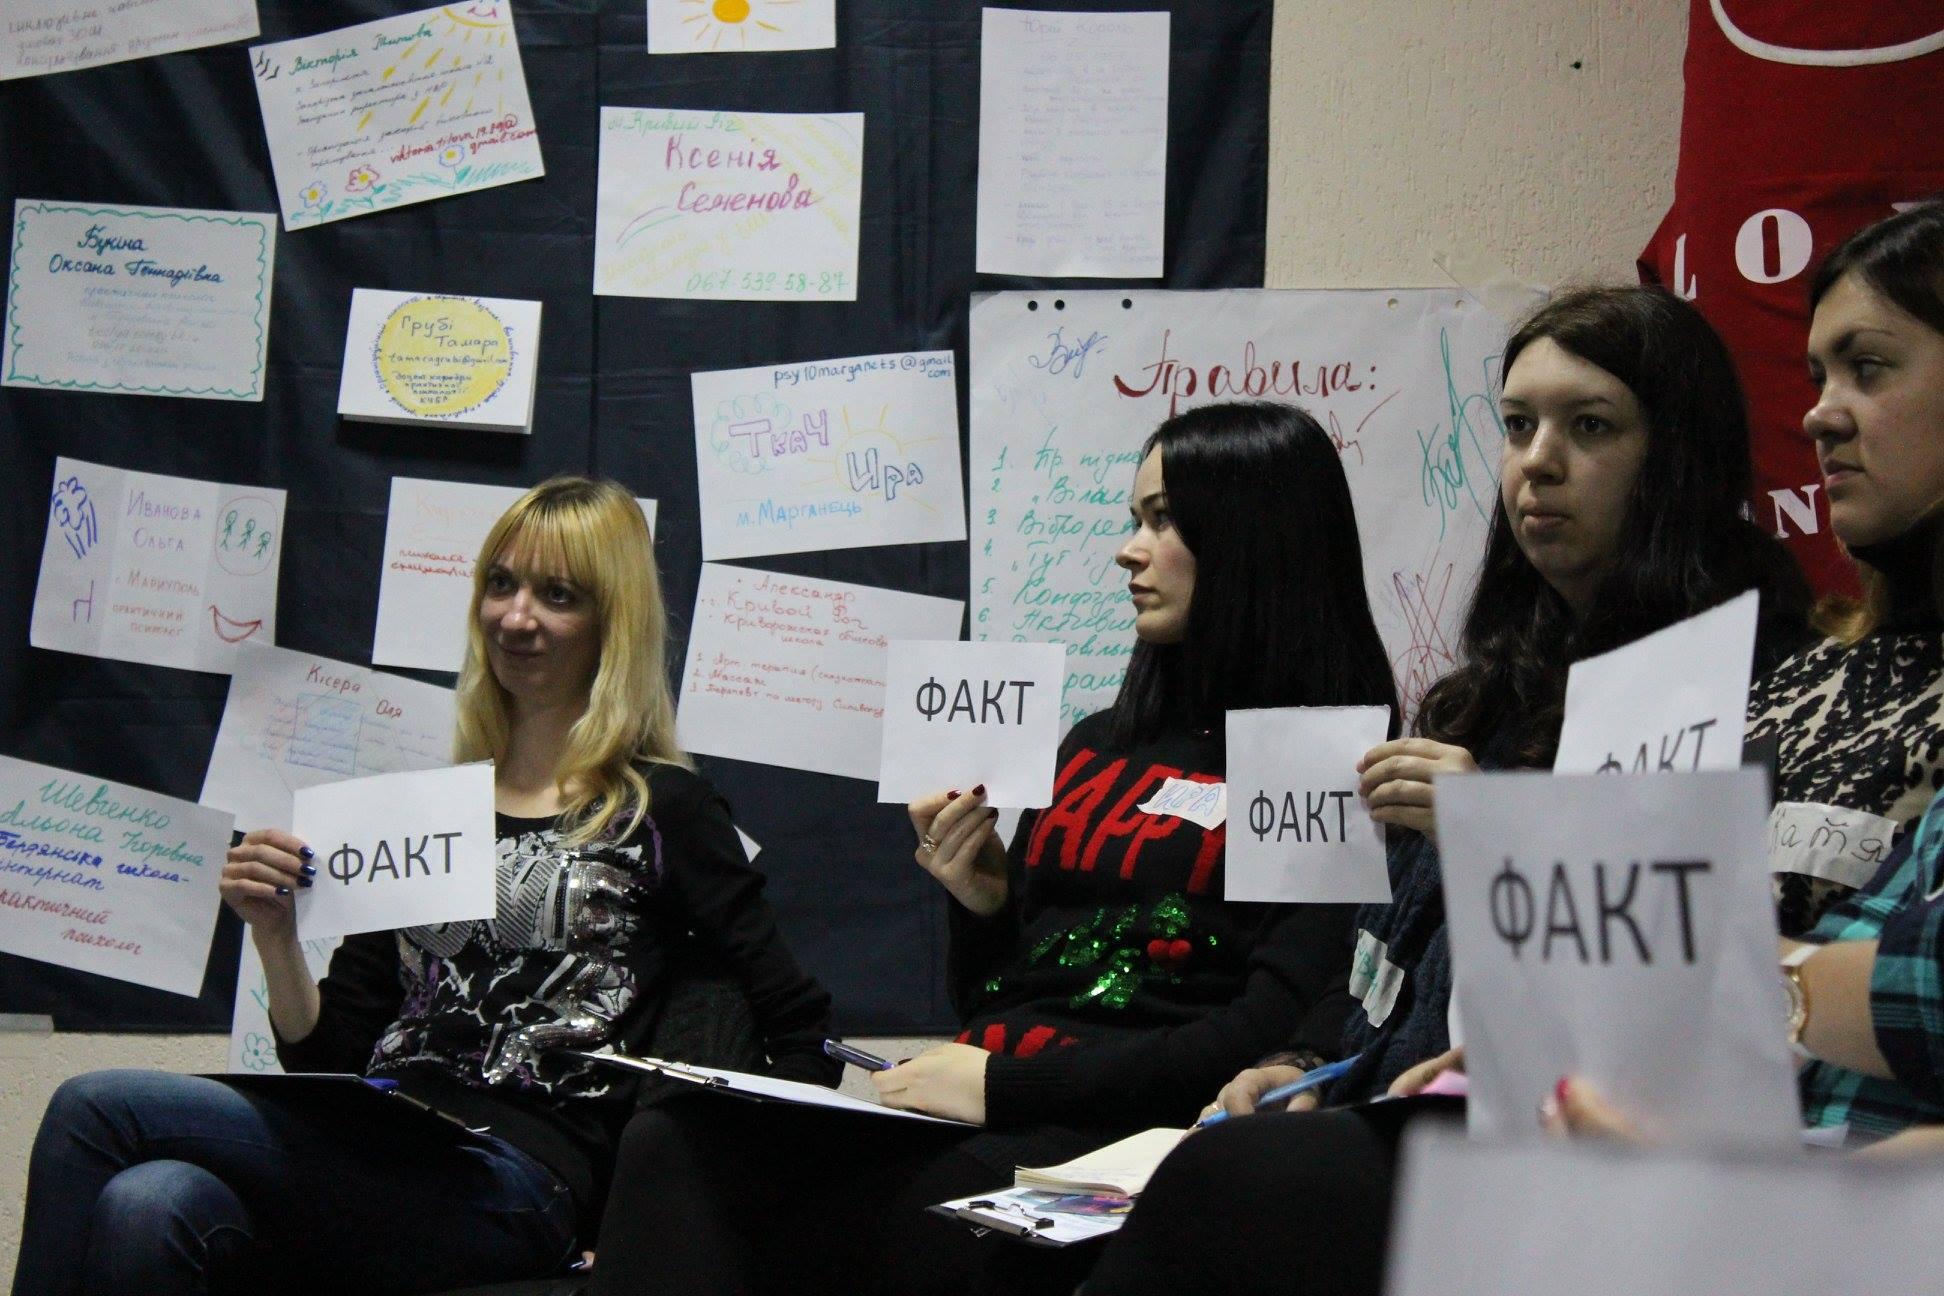 Конкурс на участь у Школі Толернатності в Кропивницькому (травень 2018)